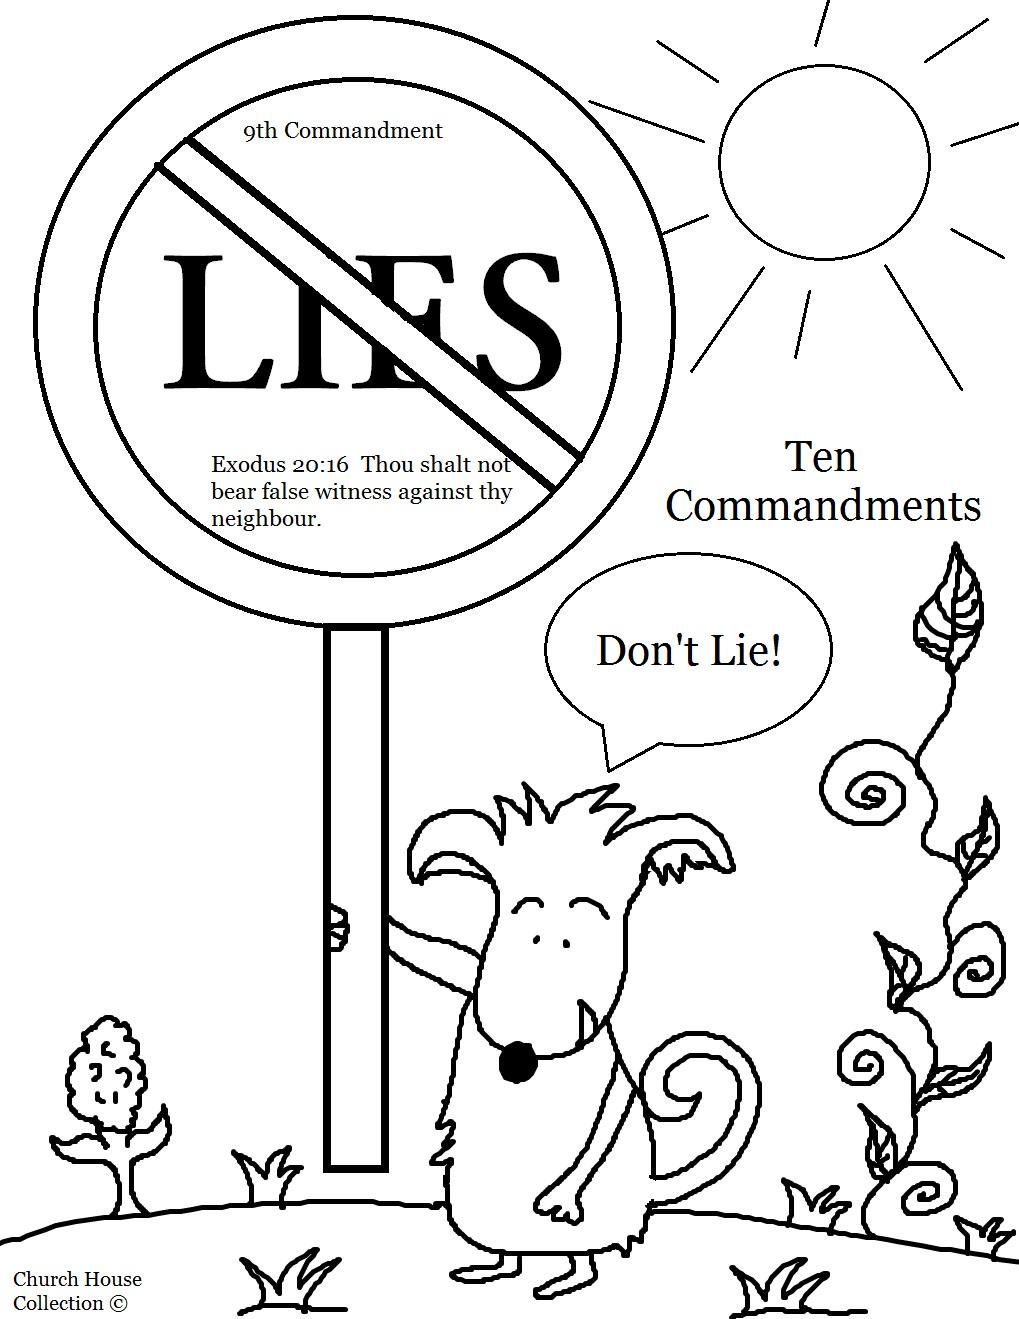 The Ten Commandments Coloring Pages